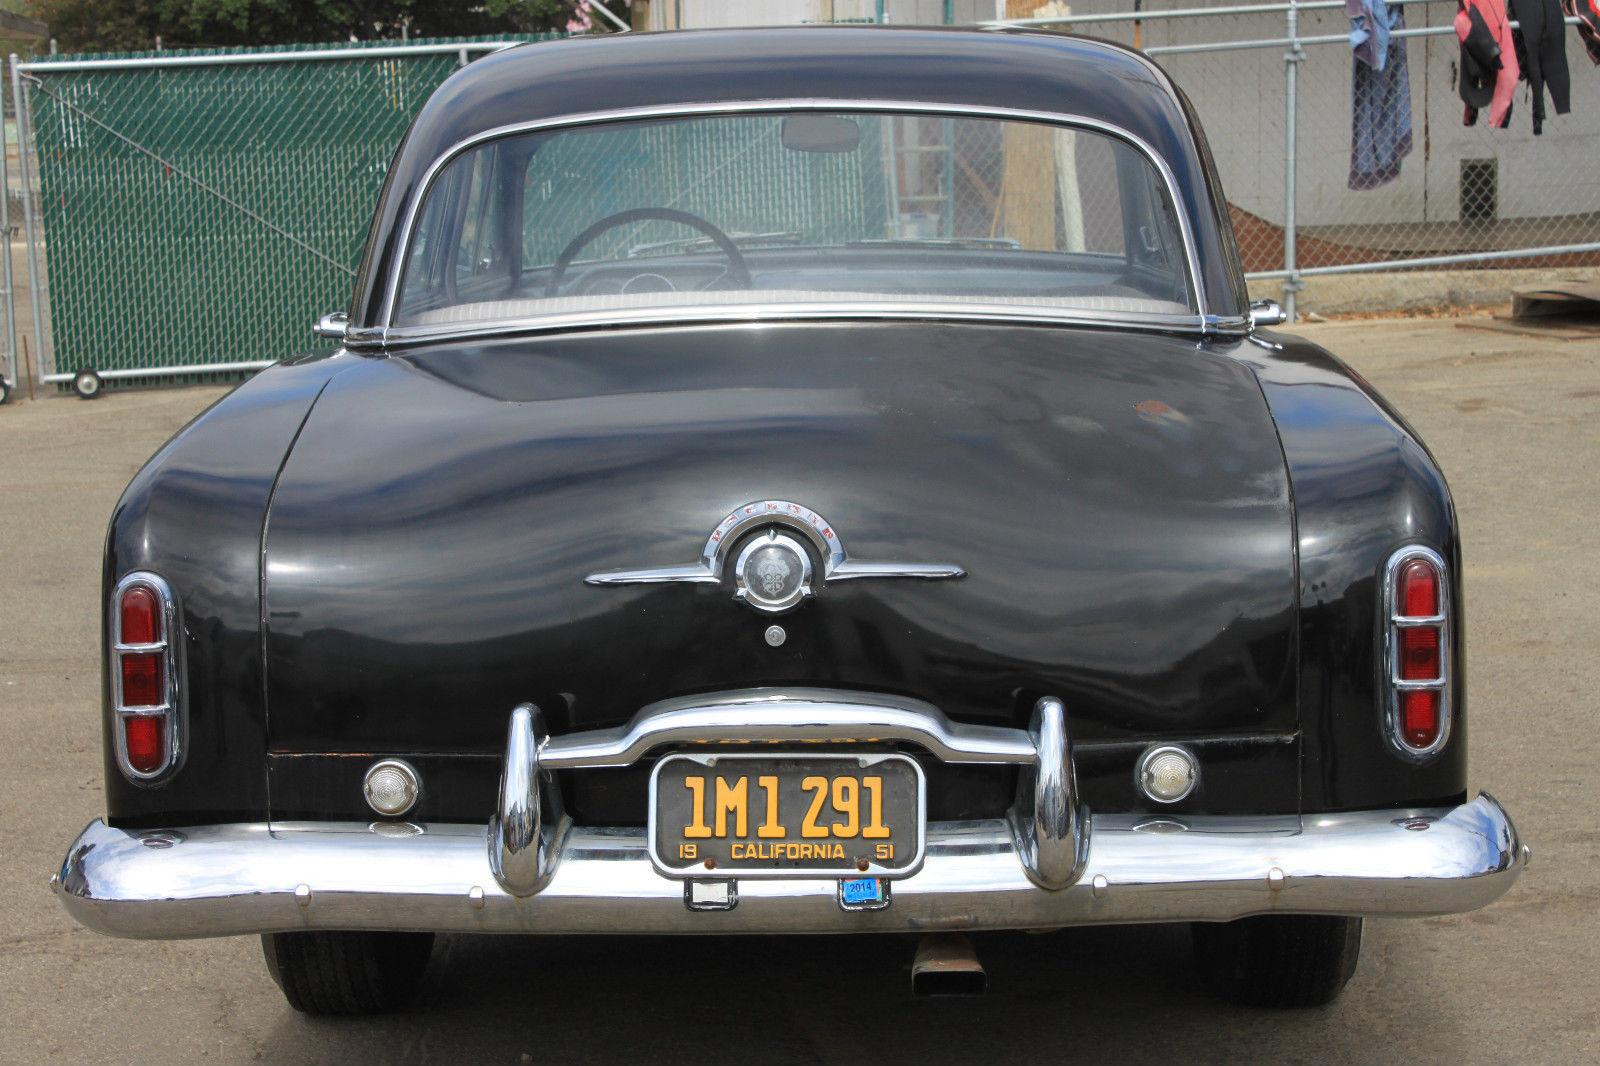 51 Packard Hot Rod Rat Rod Surviver Vintage Classic